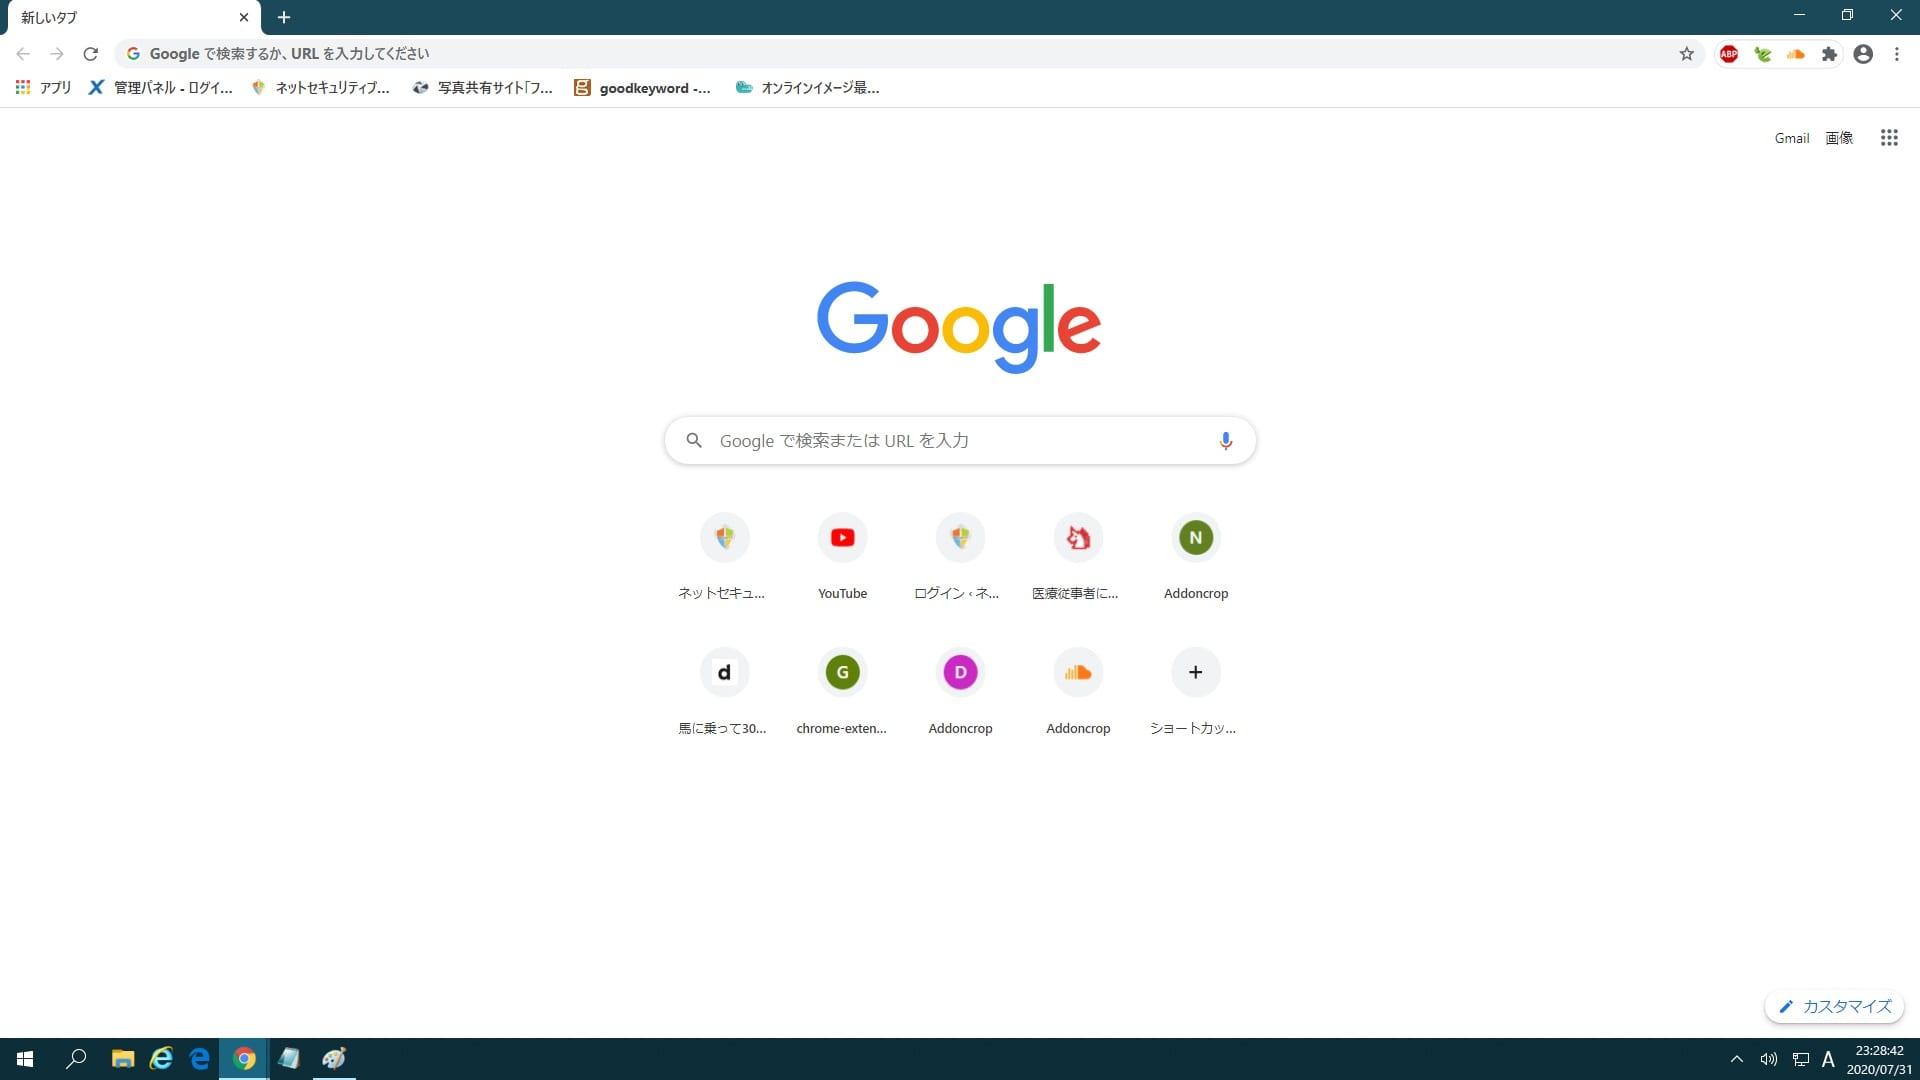 Google Chromeのアドレスバーに拡張機能のアイコンを表示した画面